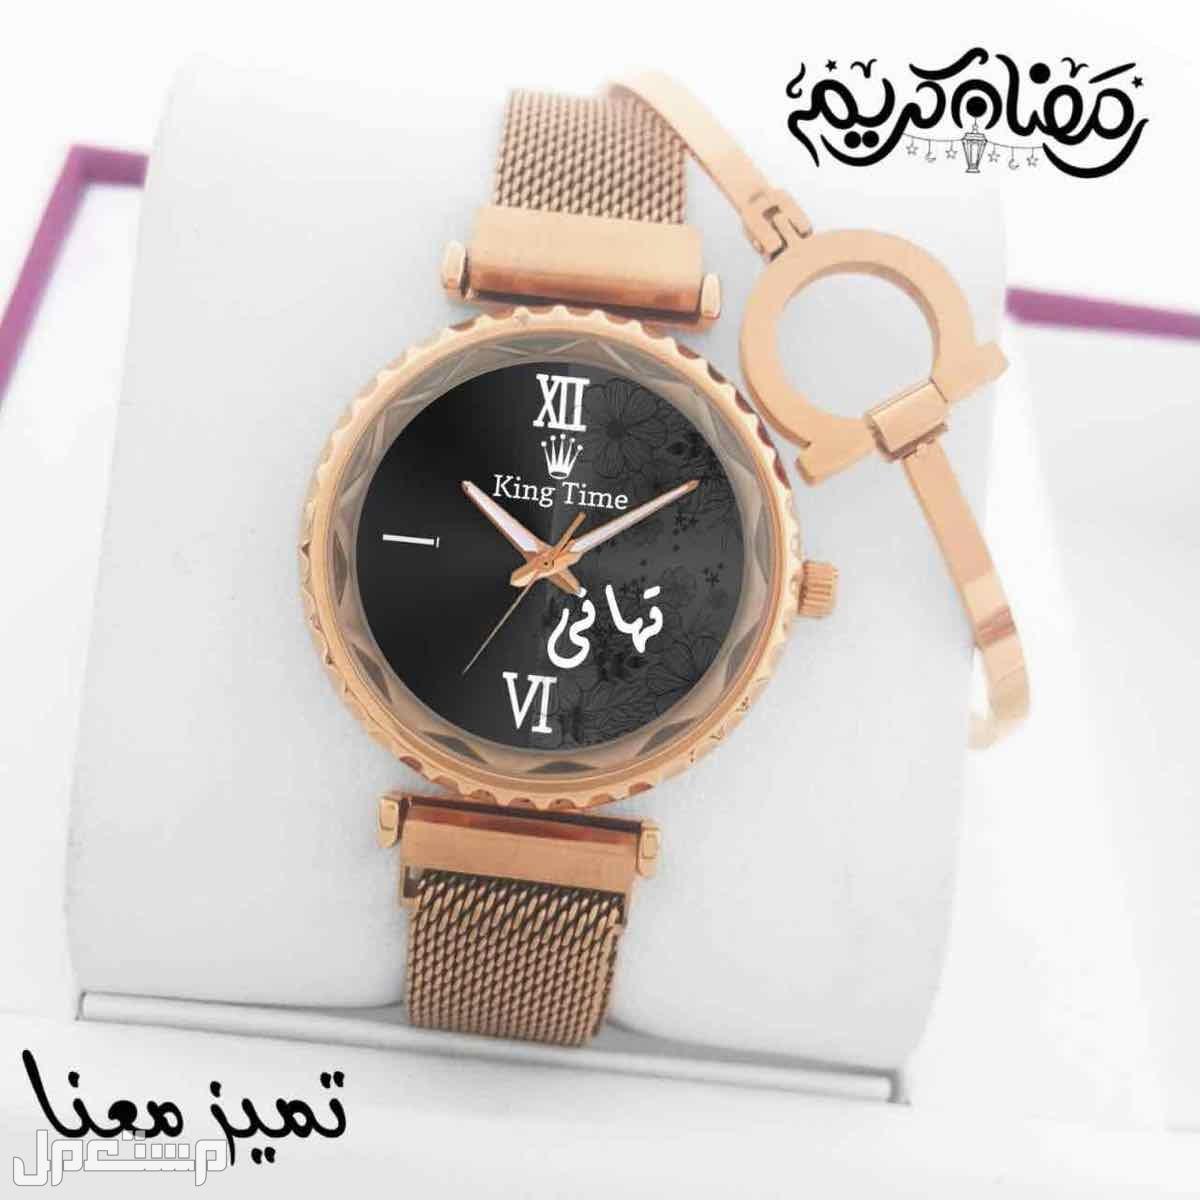 طقم نسائي ساعه مع اكسسوار تصميم بالطلب